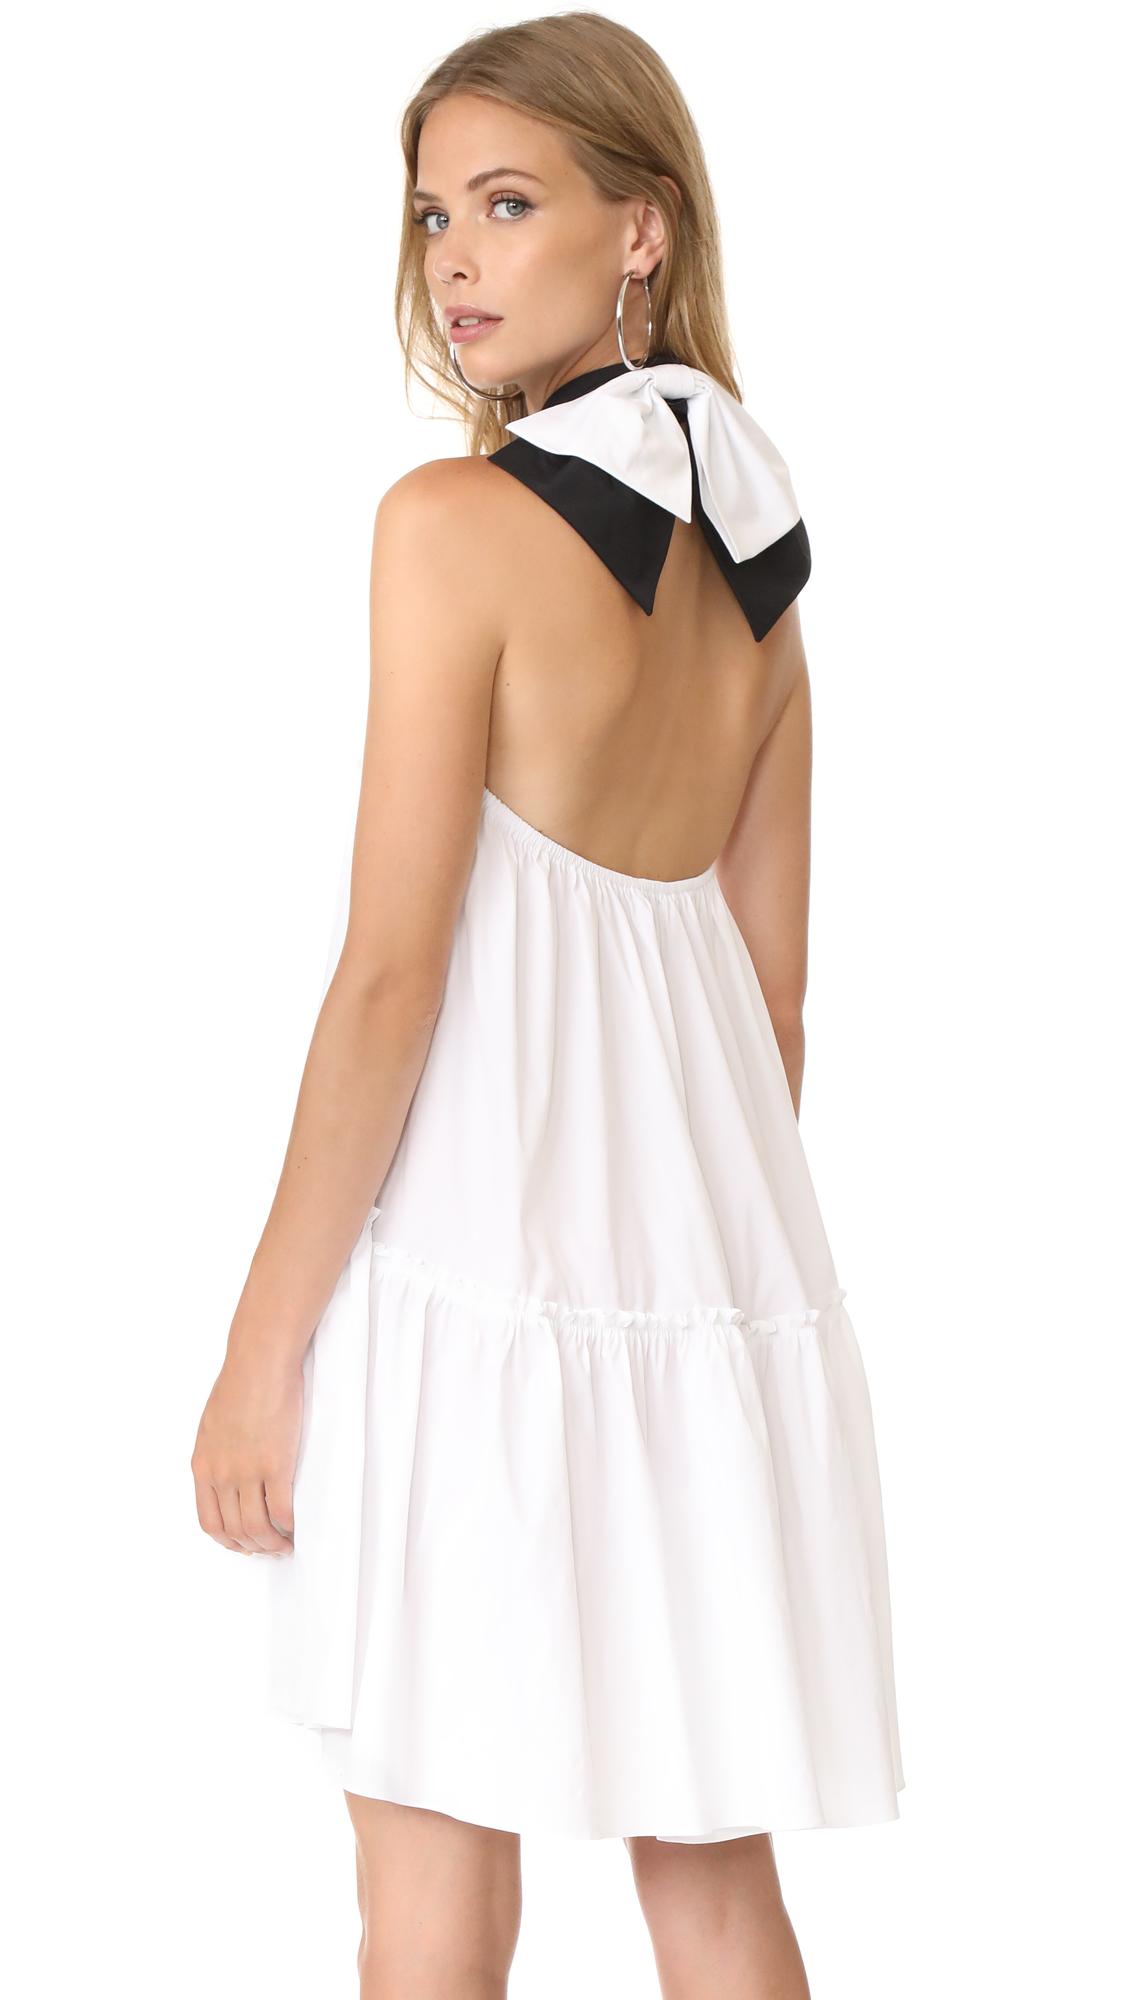 Caroline Constas Bo Dress - White/Black